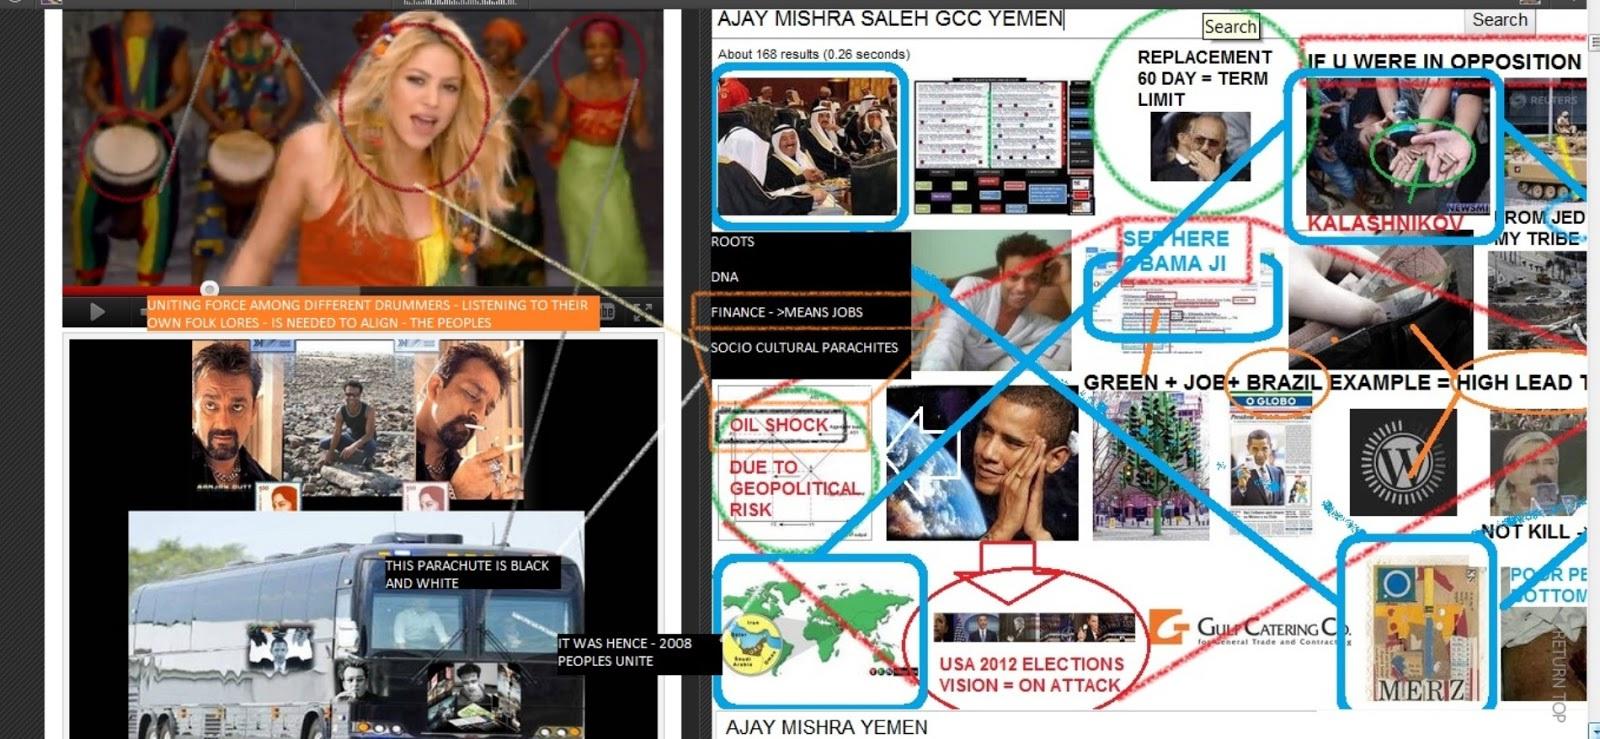 3a4a3-ajay-mishra-obama2belection2bmaps2b-2broots2b-dna-finance253djobs252bstocks2b252bstuff2b-2bsocio-cultural2blipstick-2bu2bwedgewood2bis2balso2bmapped2bto2bmamma2bmaria2btorti